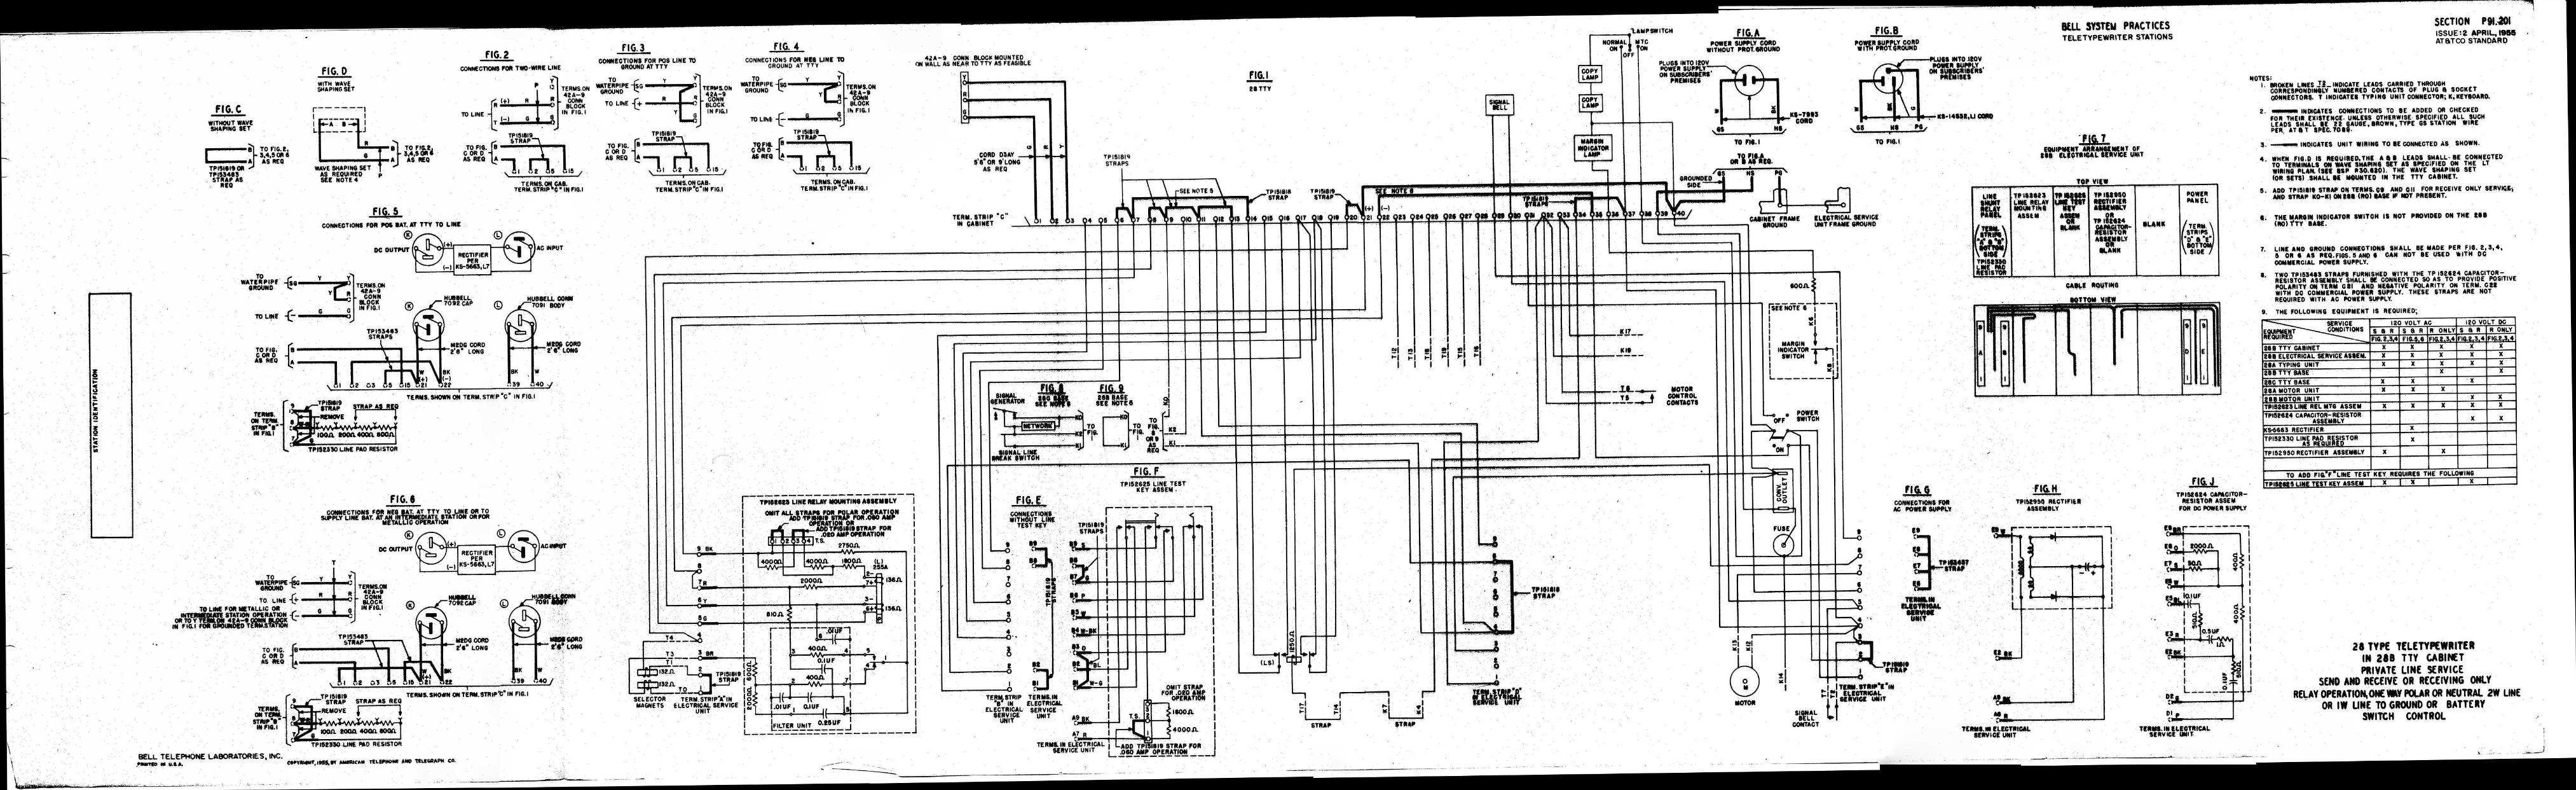 american ironhorse wiring diagram - wiring diagrams database  laccolade-lescours.fr